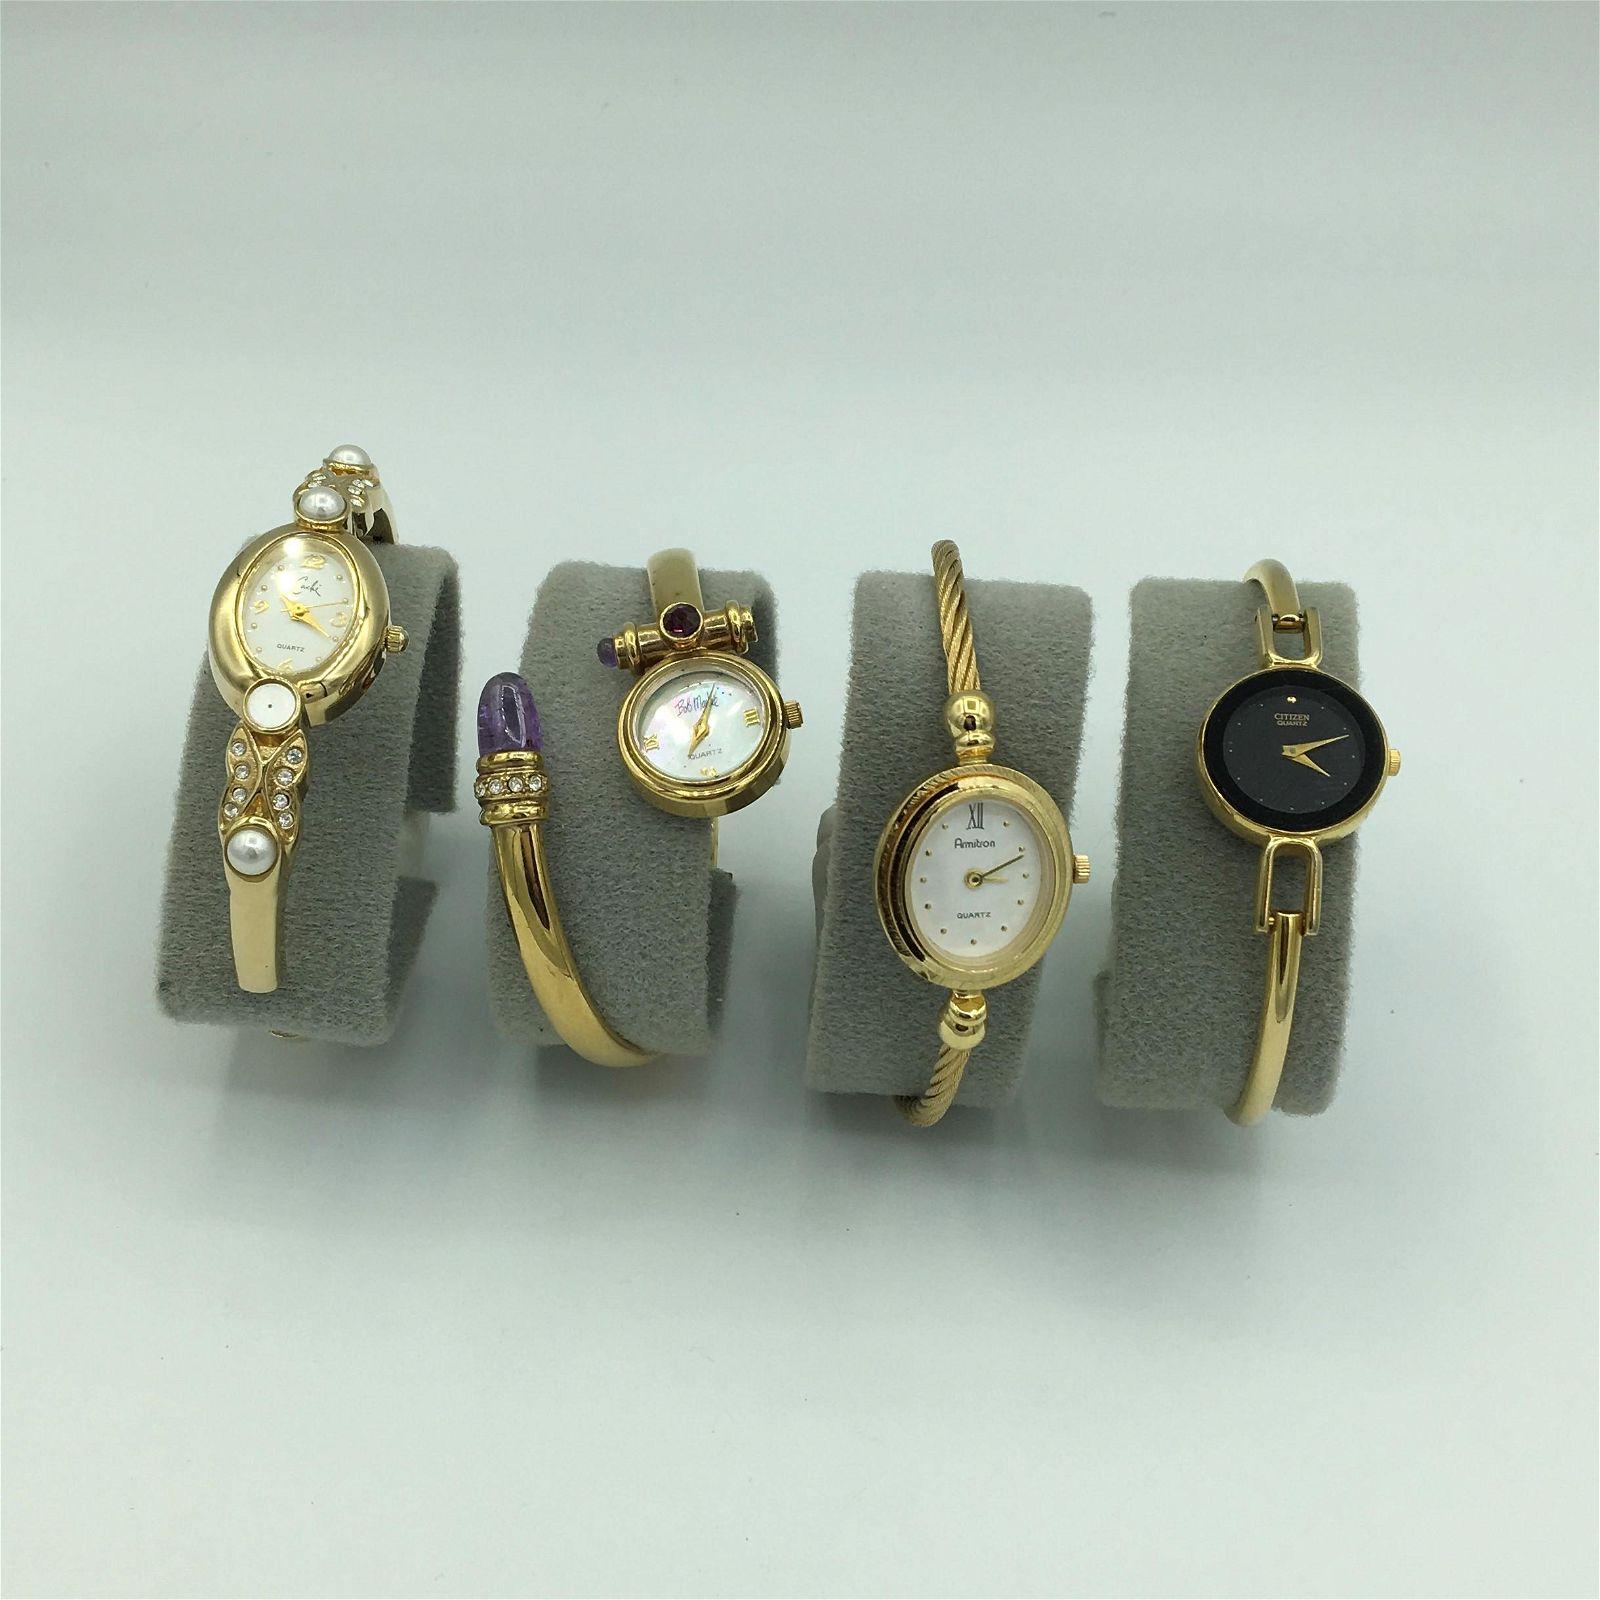 Lot 4 Fashion Ladies Quartz Wrist Watches Caché, Bob